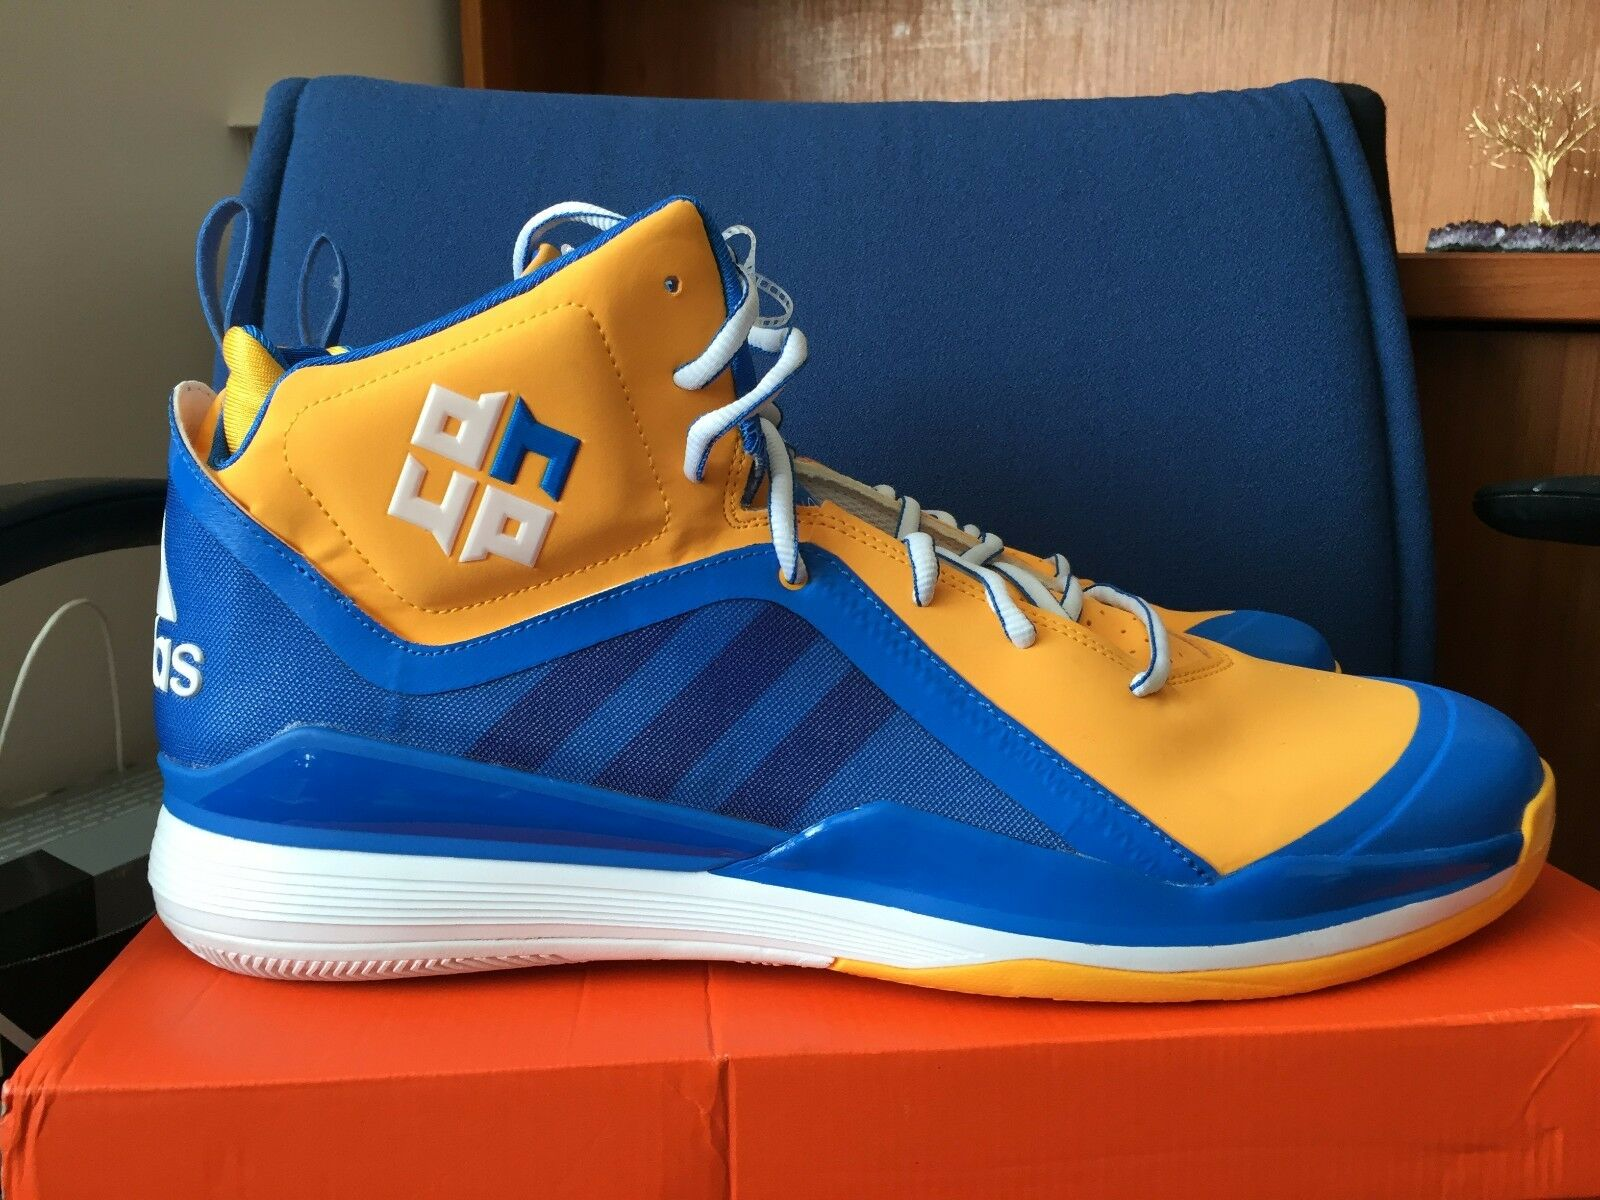 Adidas dwight d. d. d. howard 5 v uomini 17 scarpe da basket blu giallo oro jordan laney ea5f35